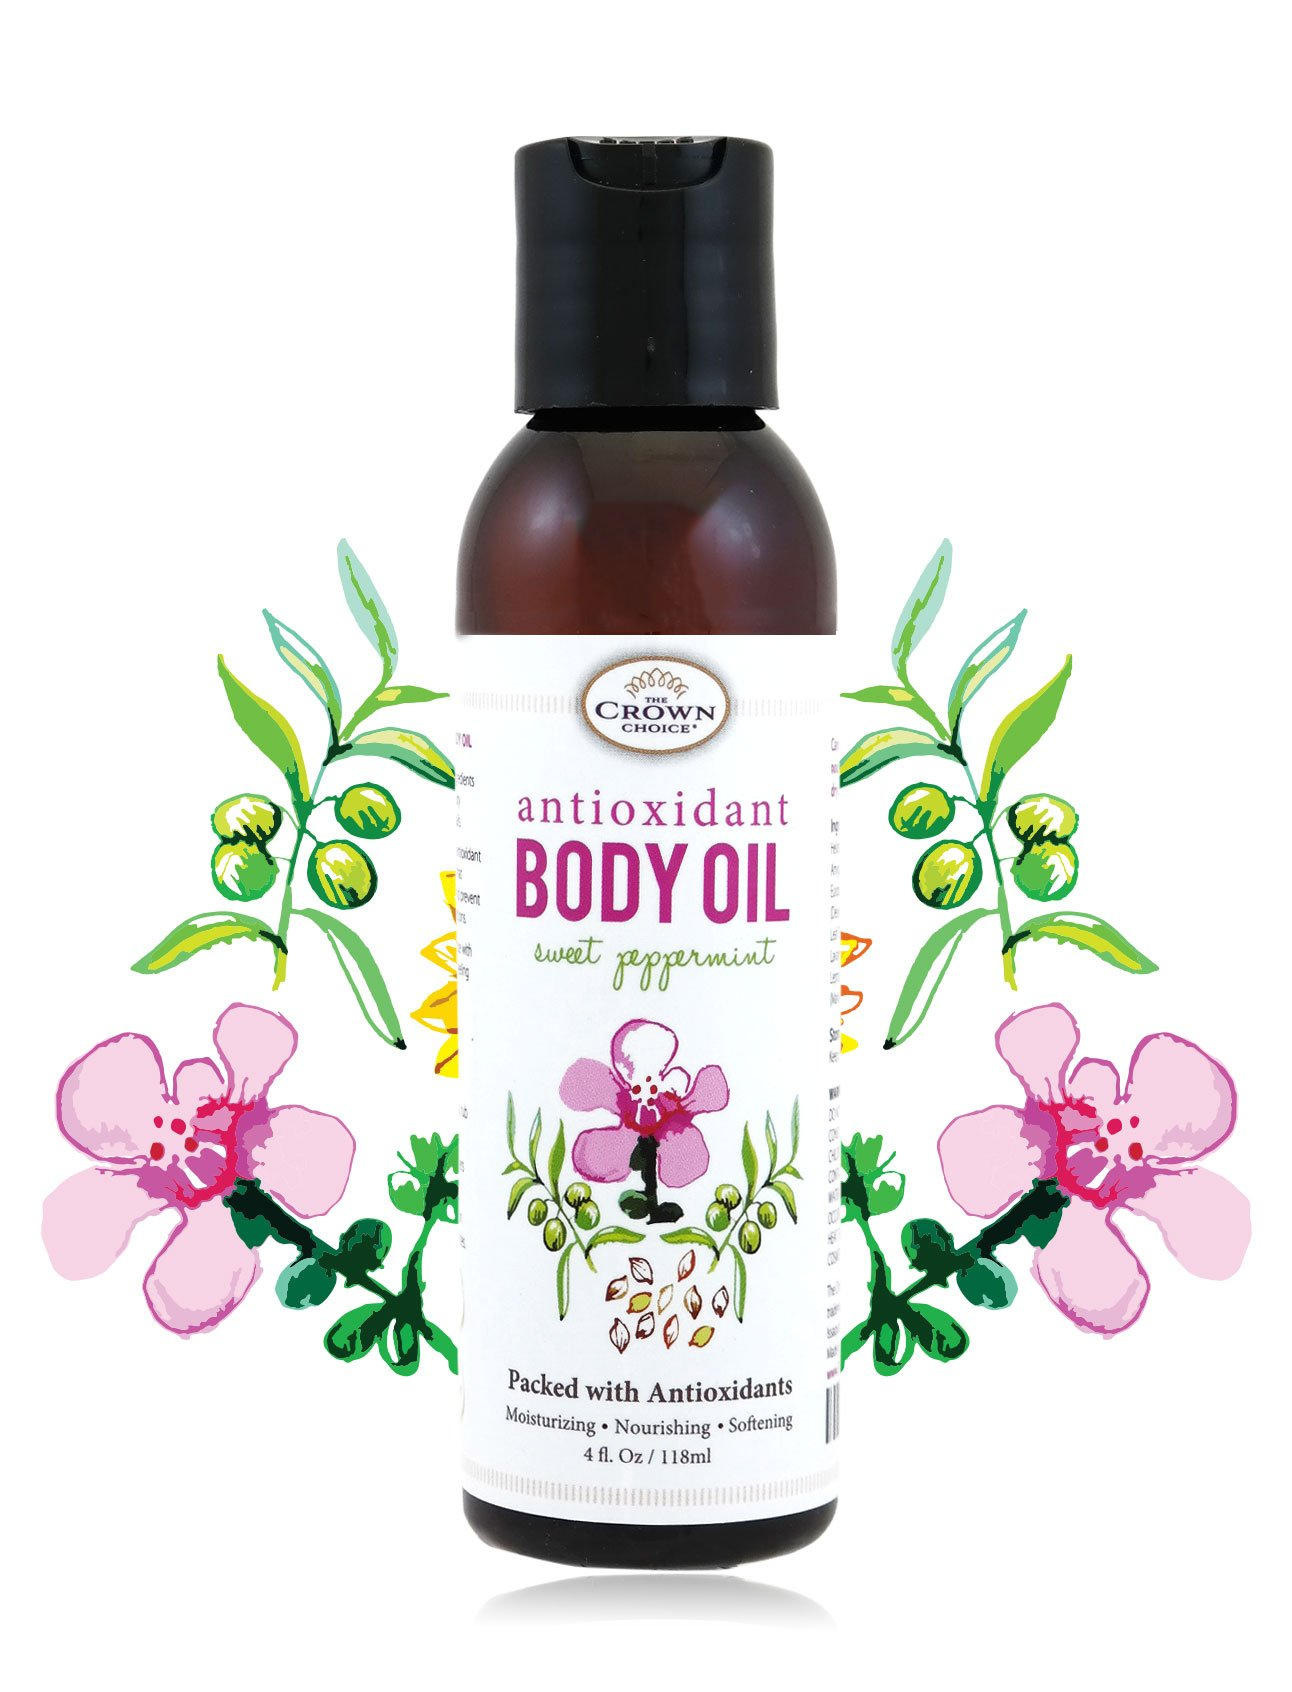 100% Natural Antioxidant Body Oil for Skin and Hair | Antioxidant Rich Moisturizing Oils Soothe Dry and Sensitive Skins | Desert Date, Manuka, Sunflower, Almond, Olive Oils & Vitamin E